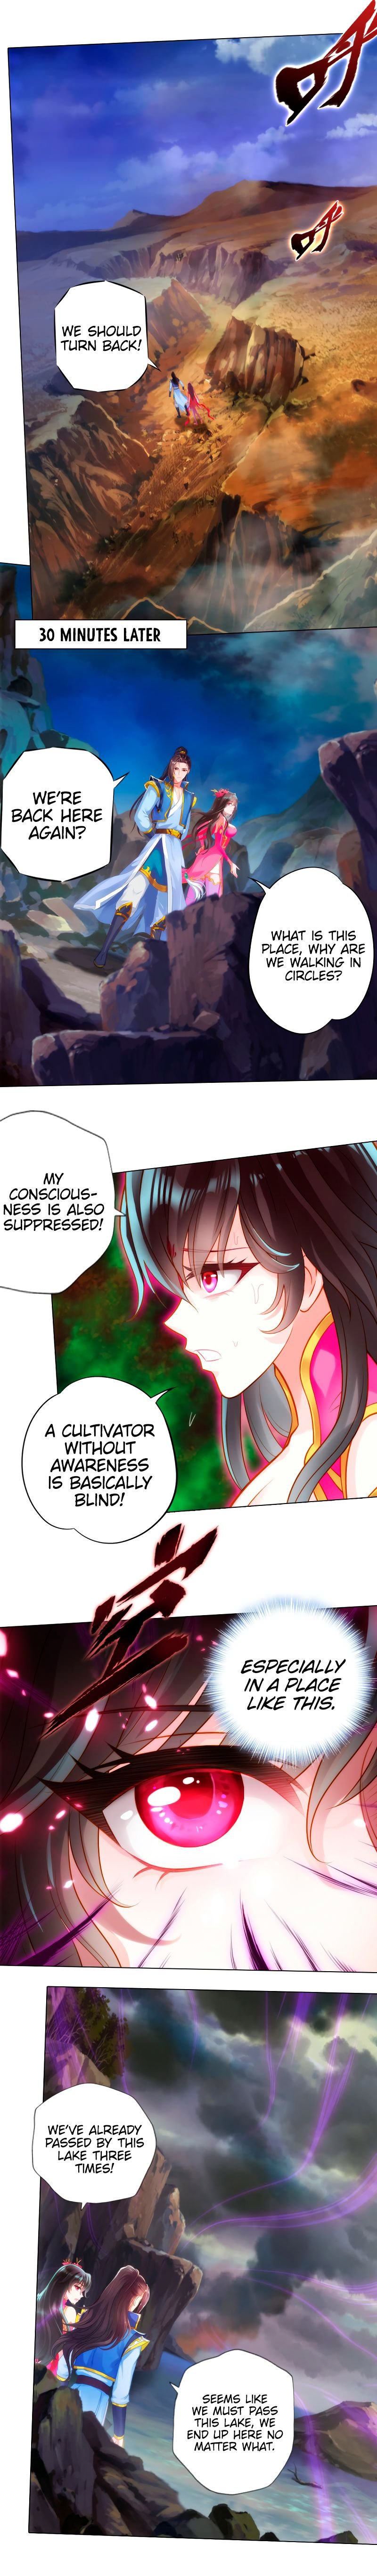 Manga Lang Huan Library - Chapter 78 Page 3